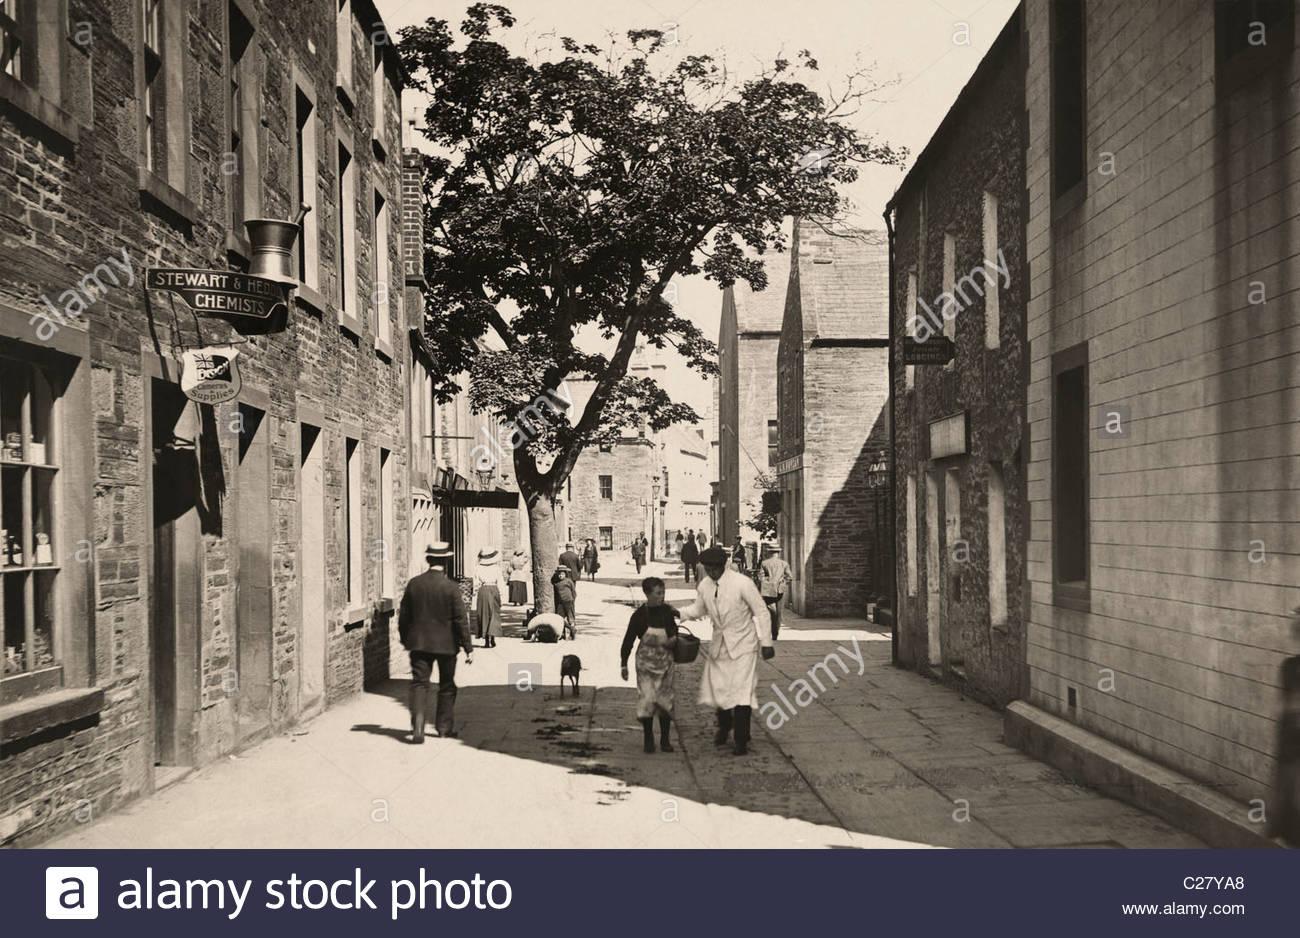 A single tree grows on Albert street. - Stock Image